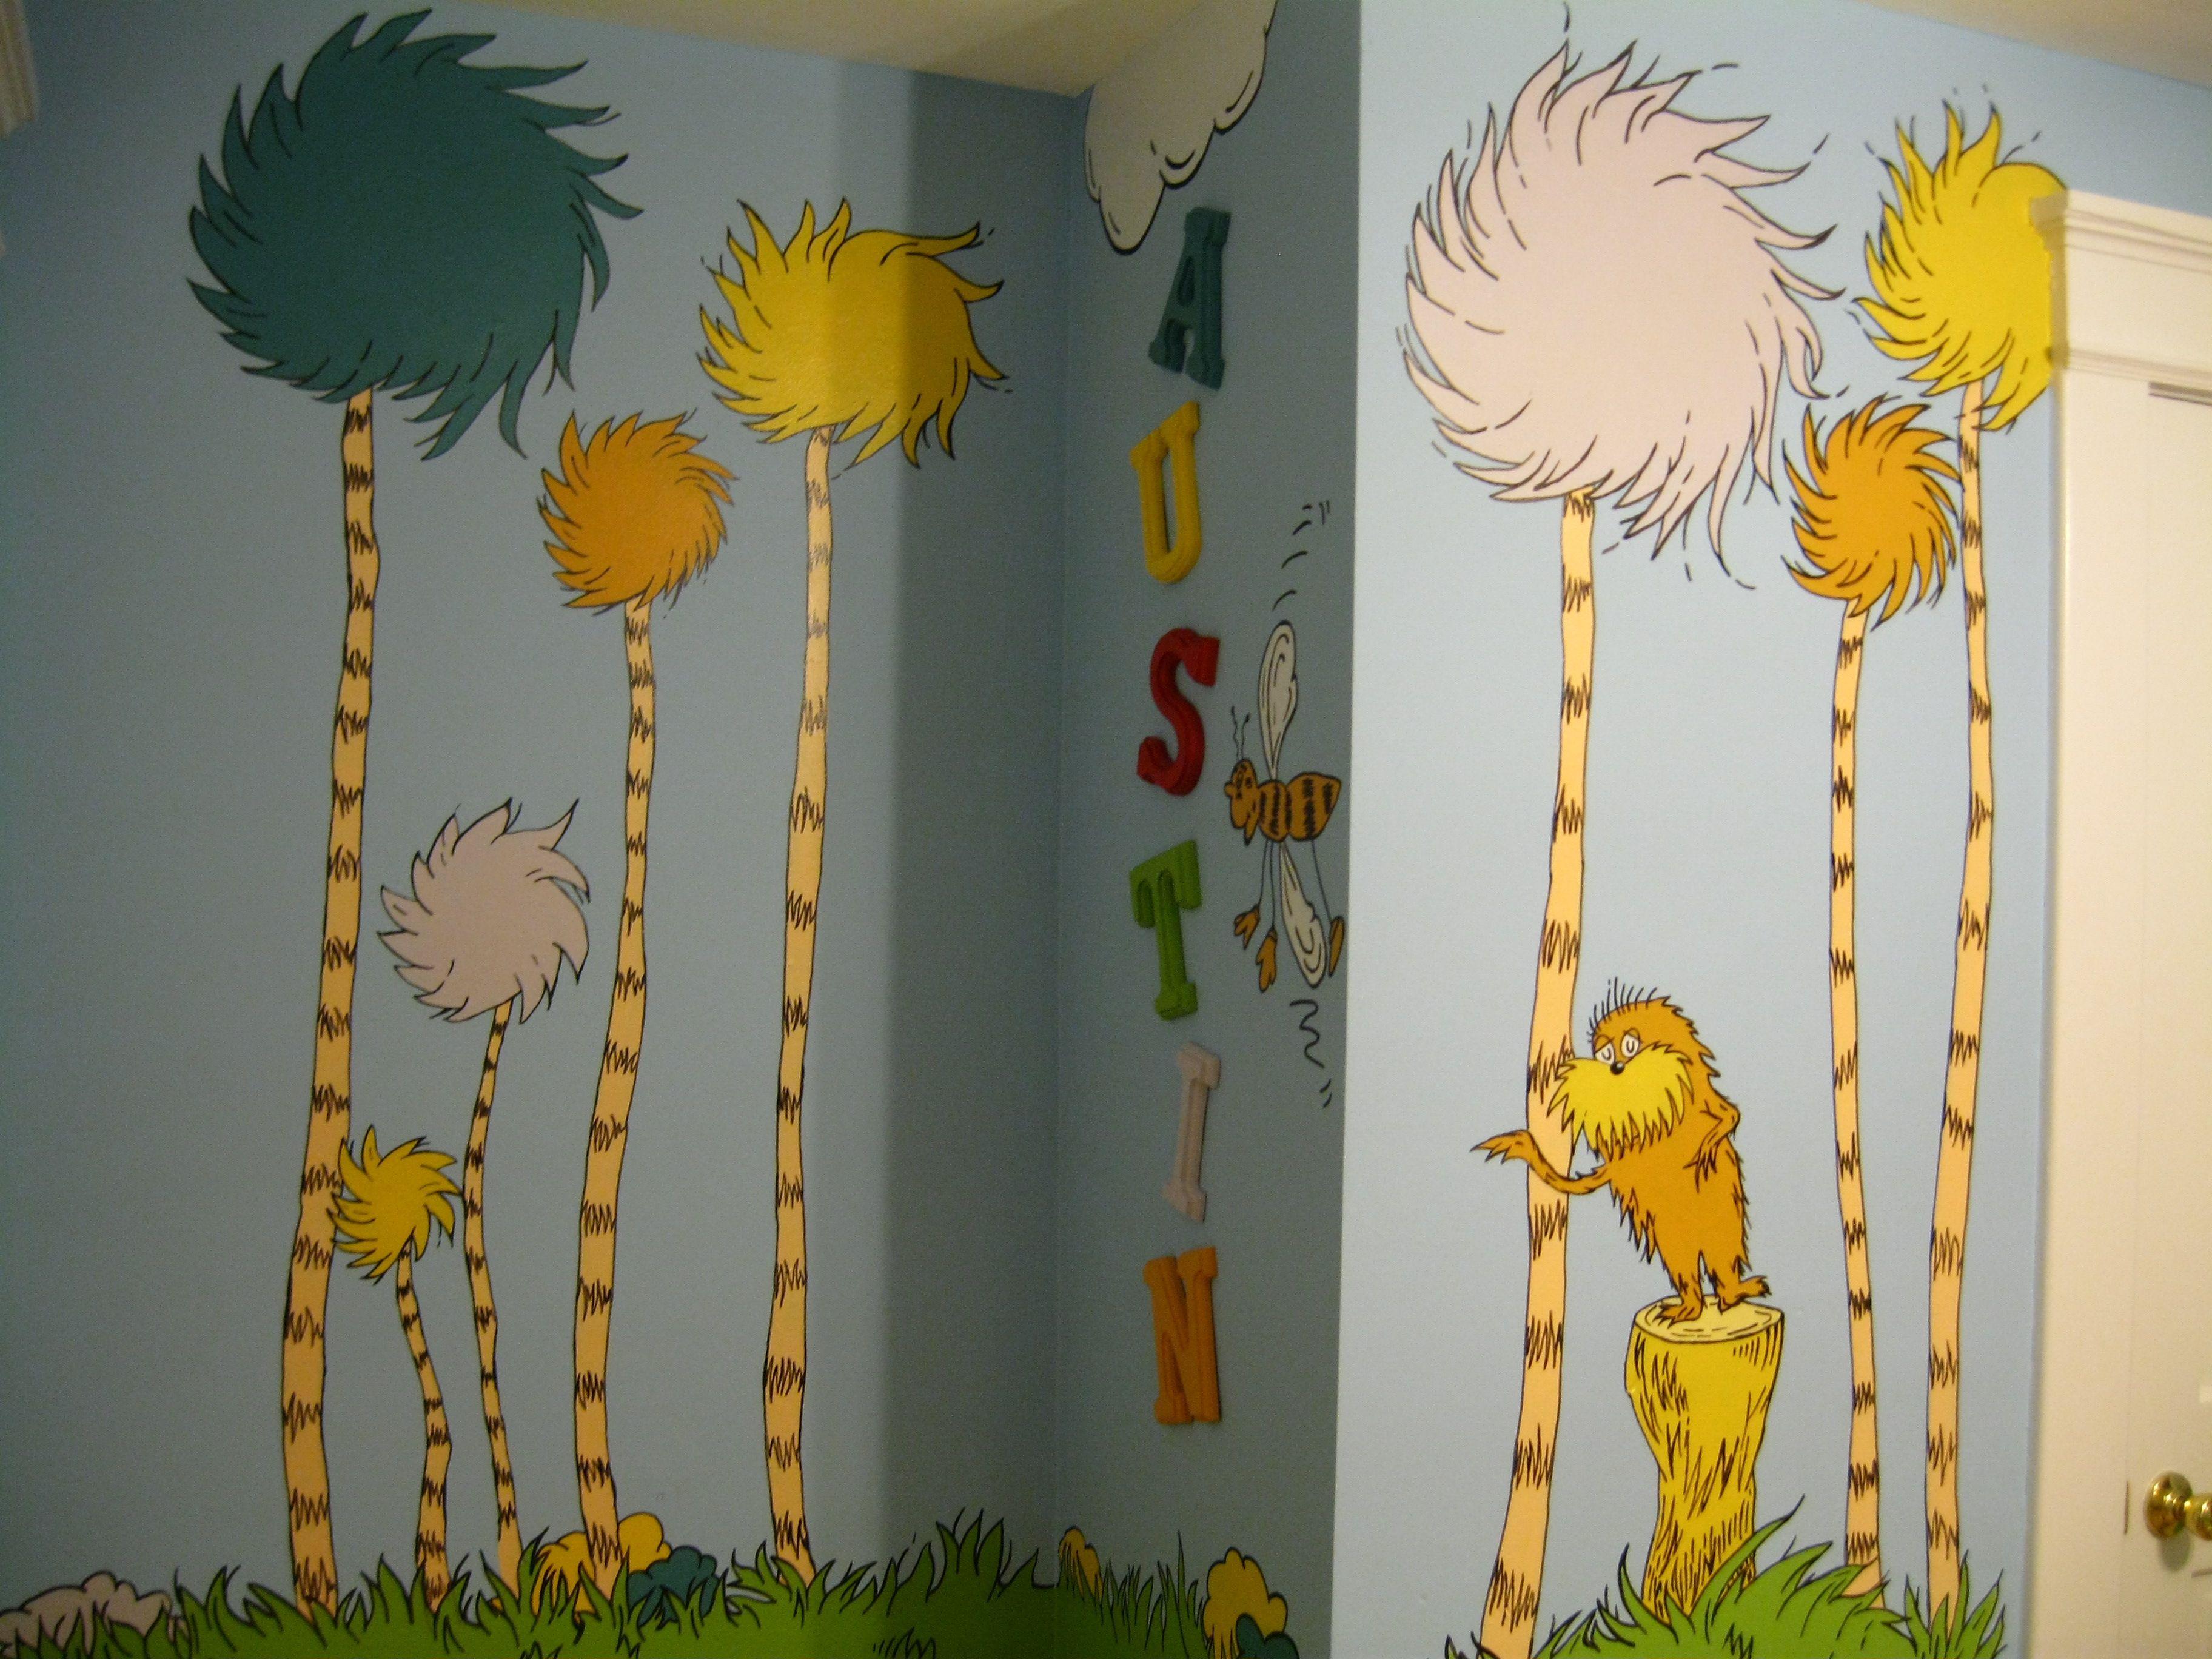 Dr. Seuss, the Lorax, Mural, Nursery | Baby stuff | Pinterest